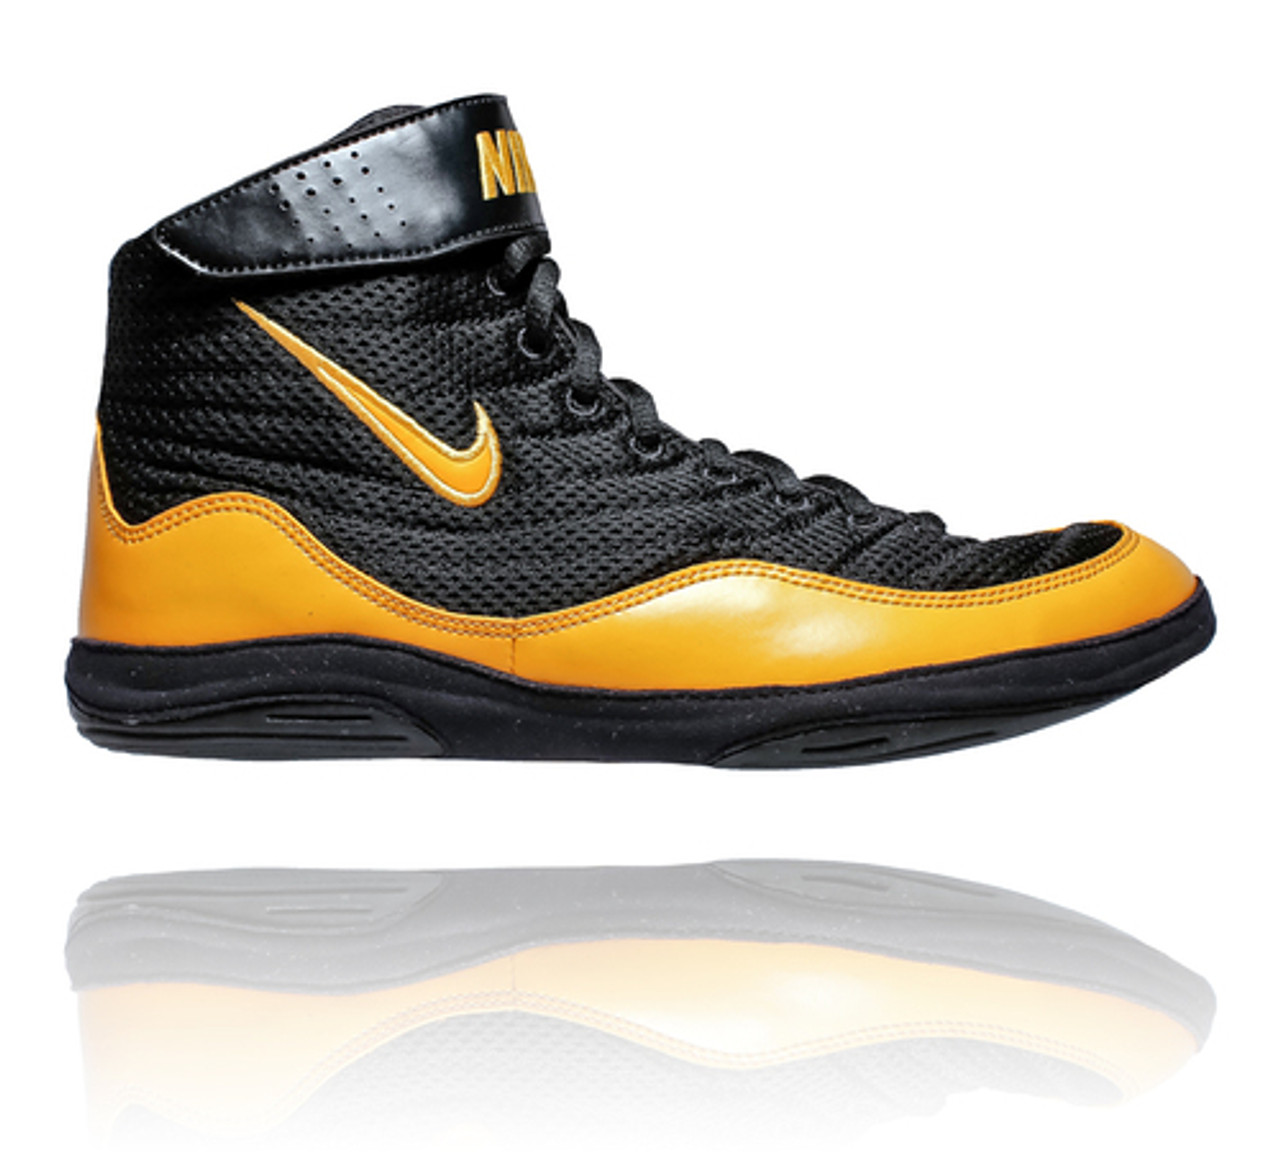 Nike Inflict 3 - Black / University